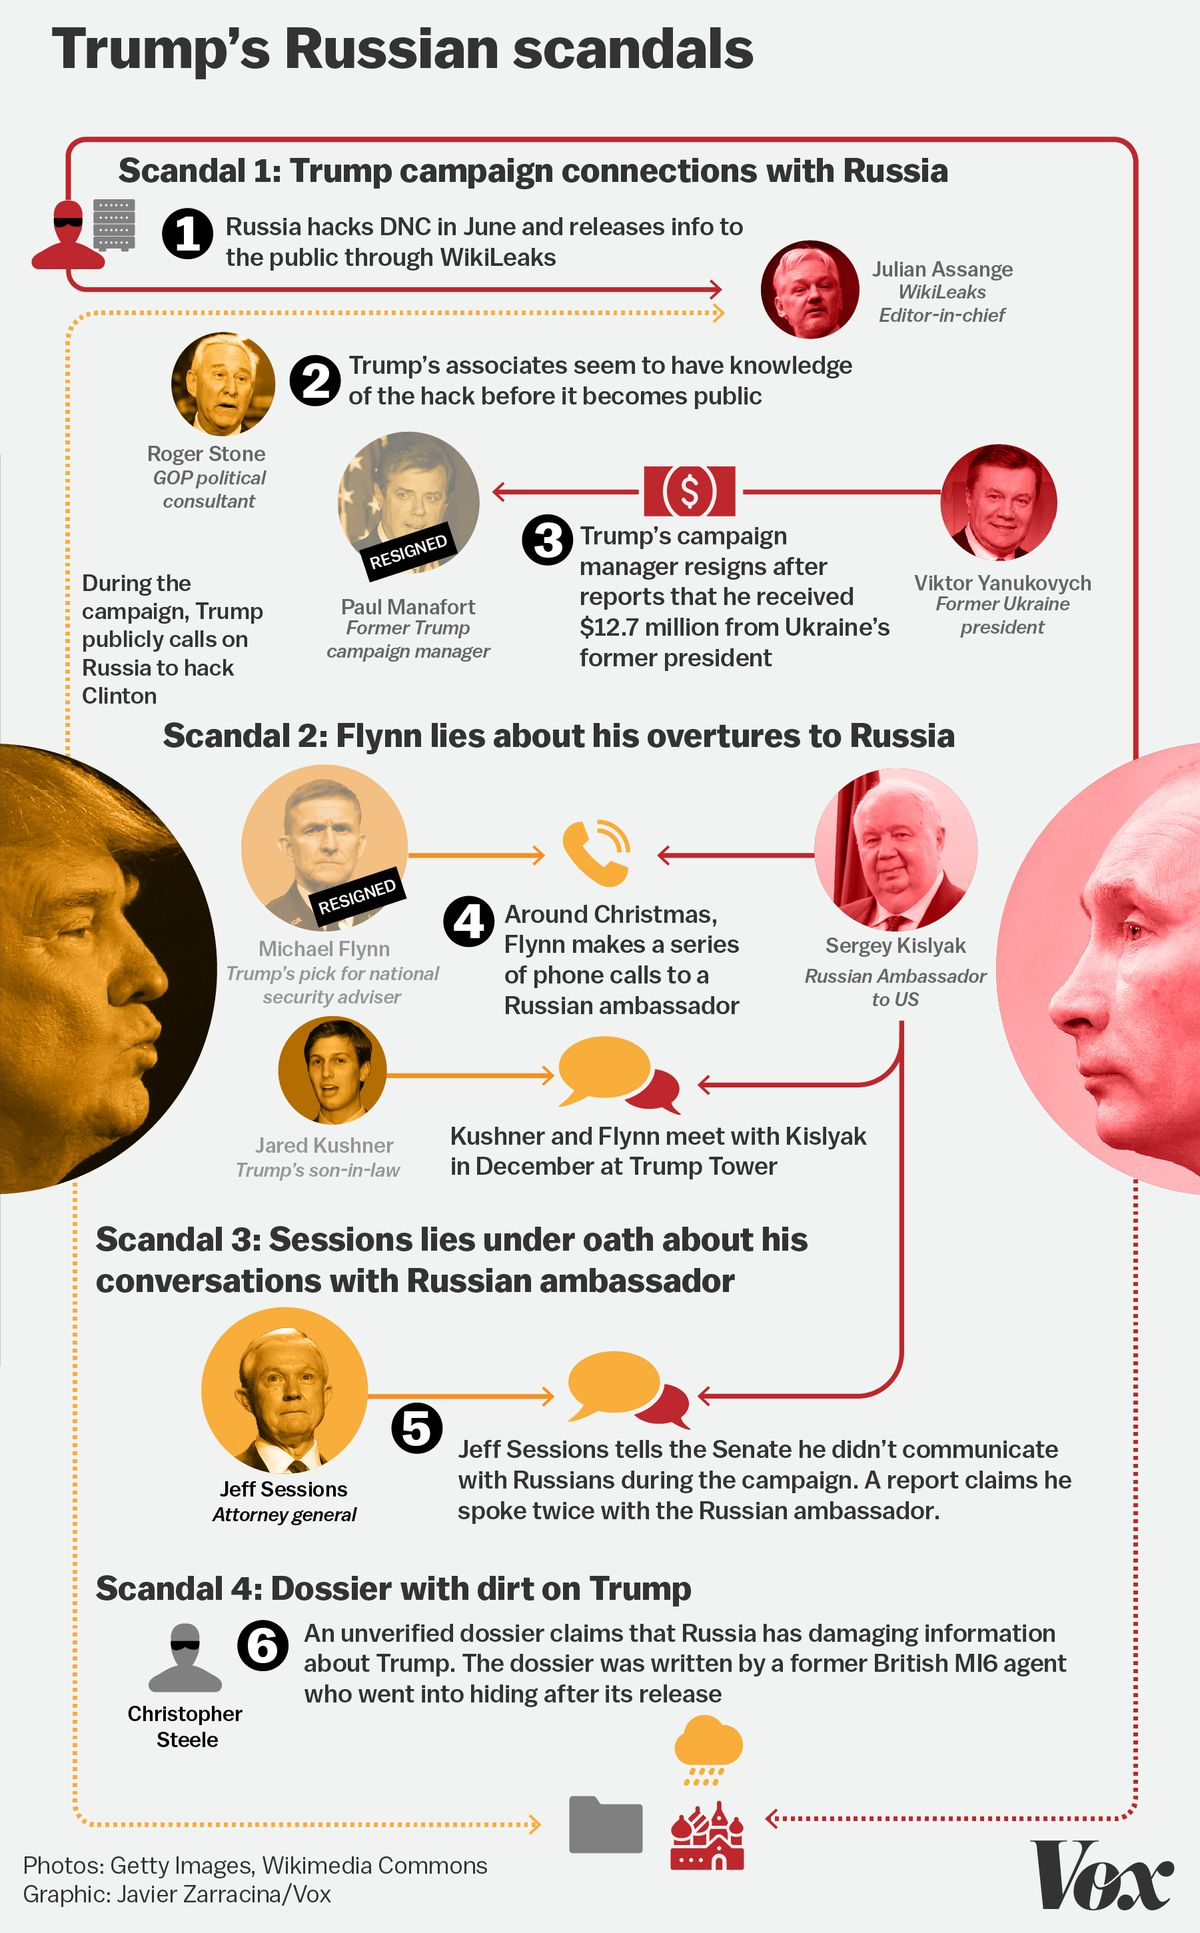 the trumprussia scandals a quick visual guide vox